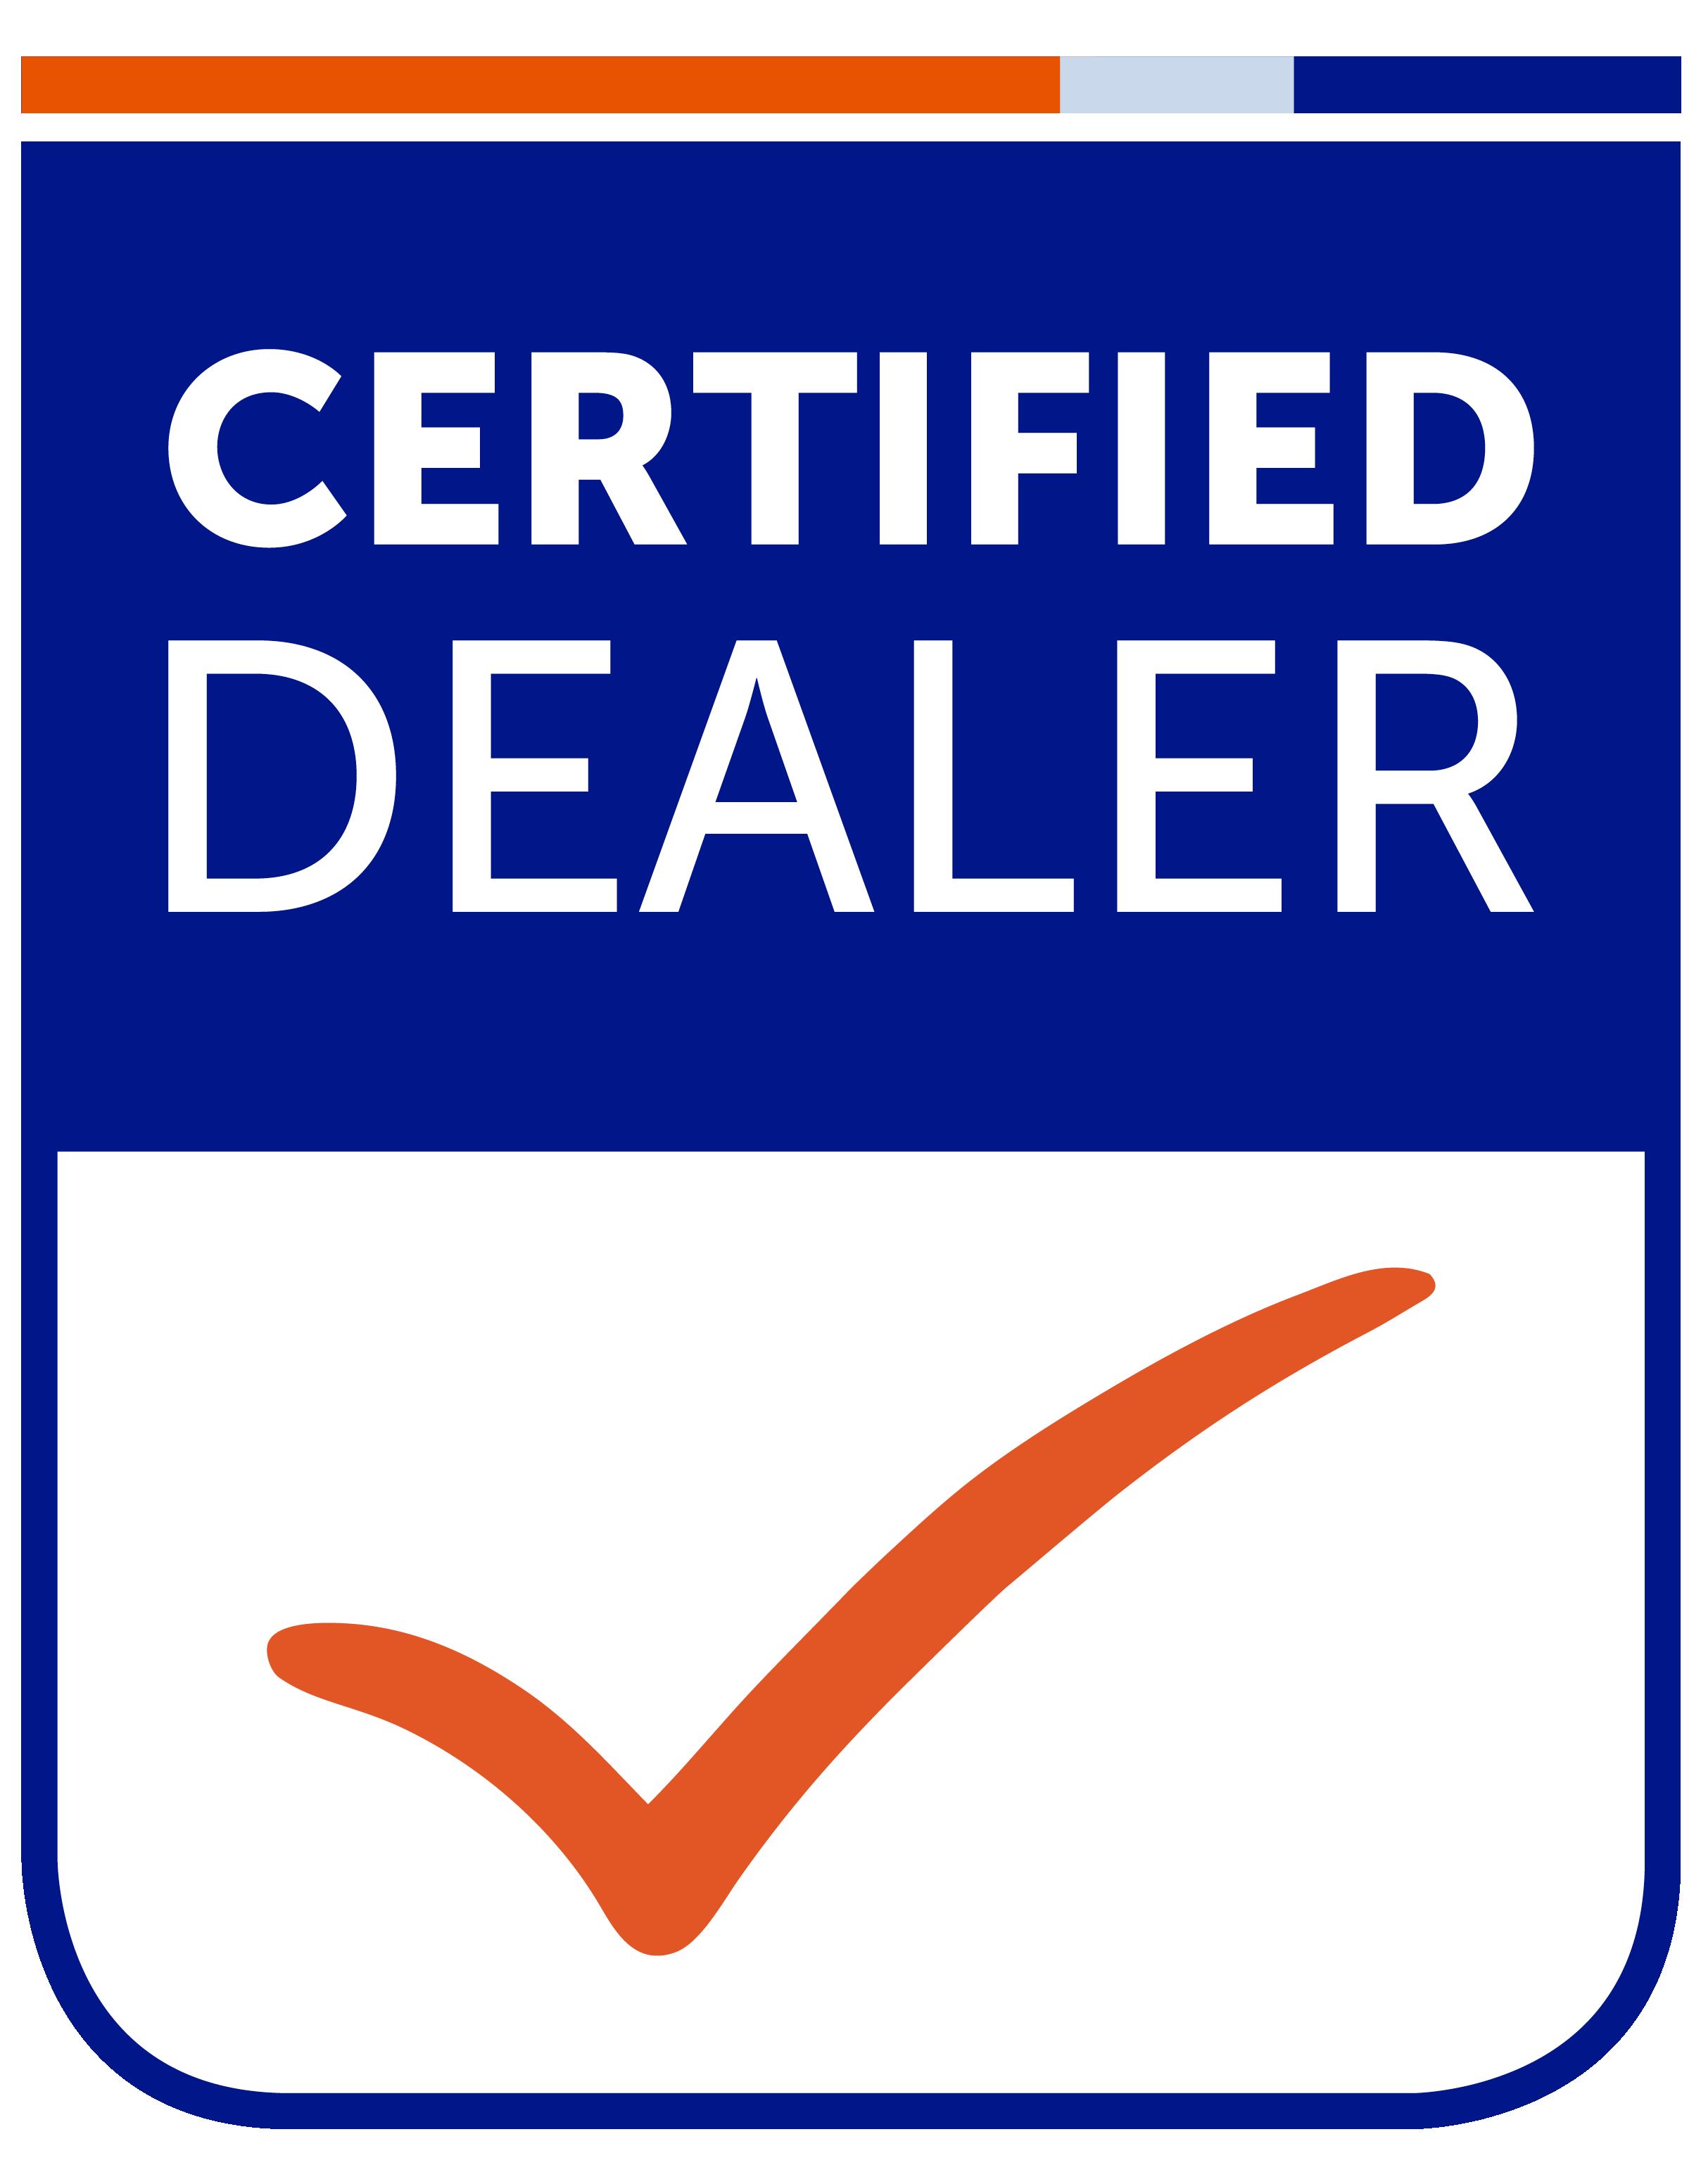 Galpin Honda Mission Hills Galpin Honda Honda Service Center Dealership Ratings